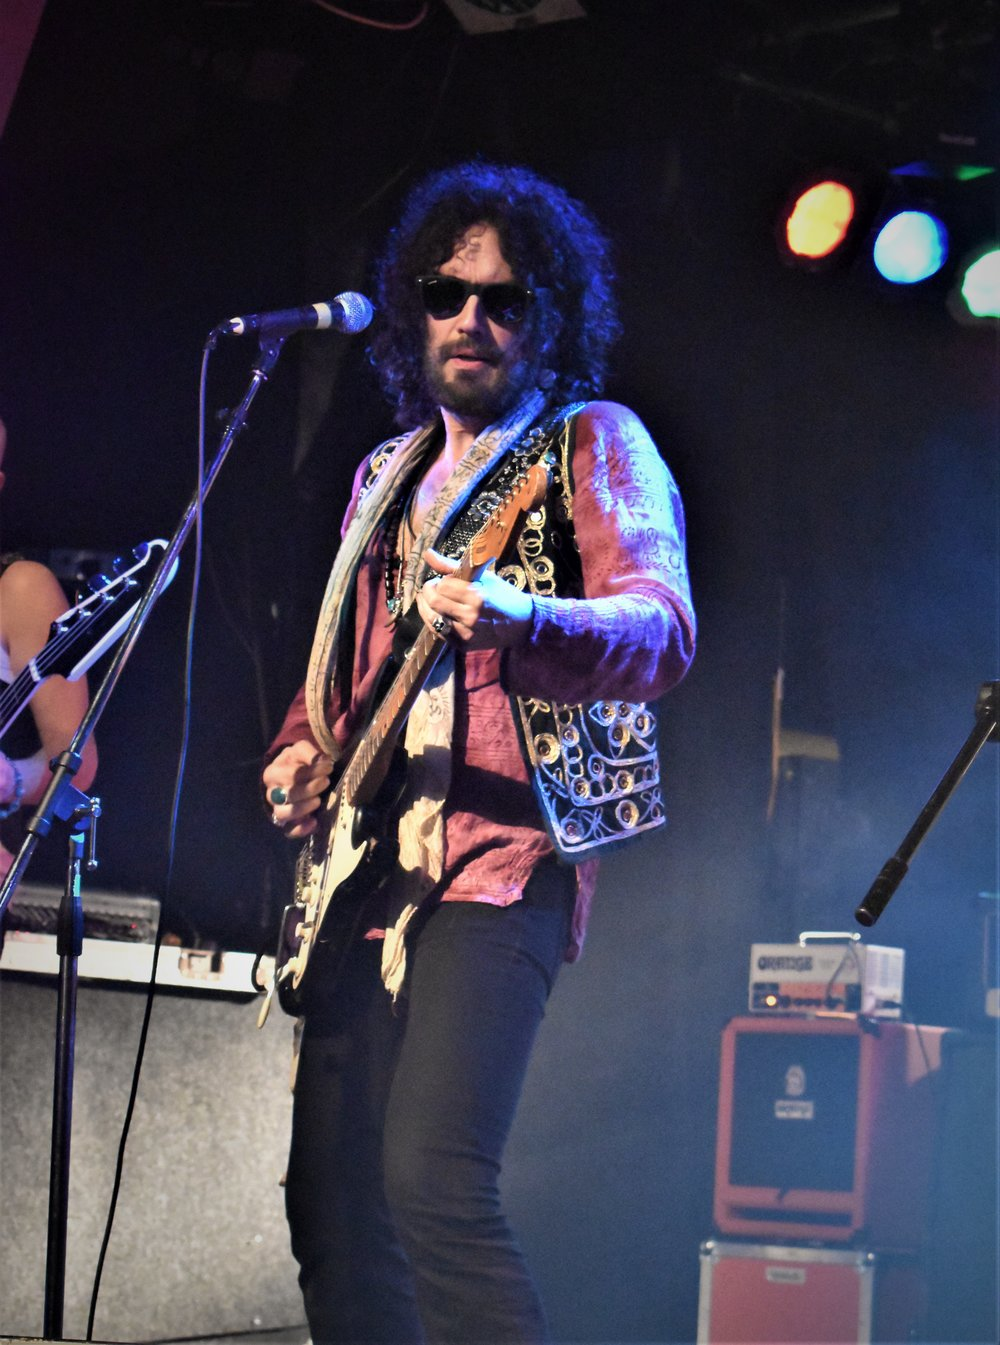 Electric Boys at Tivoli, Buckley on March 22nd 2019